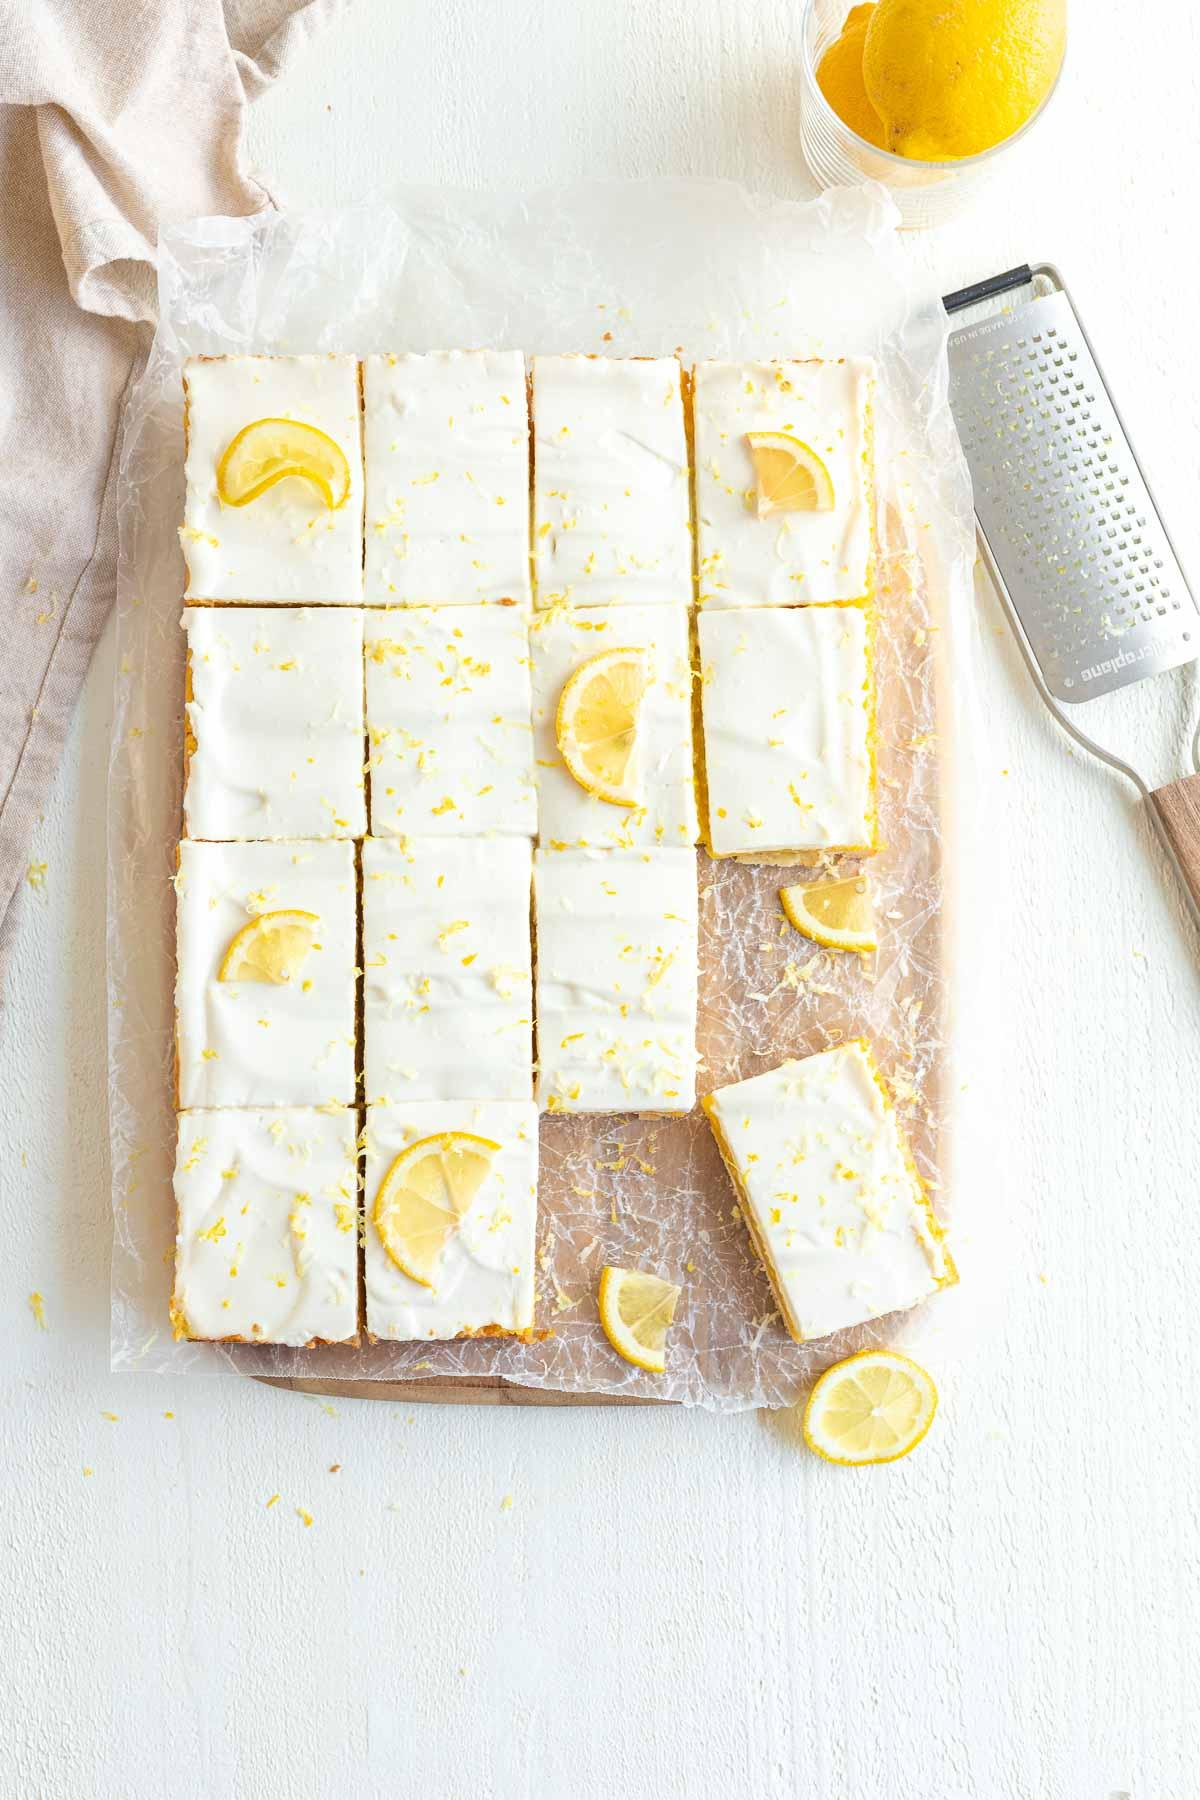 Lemon Shortbread Bars with candied lemon garnish